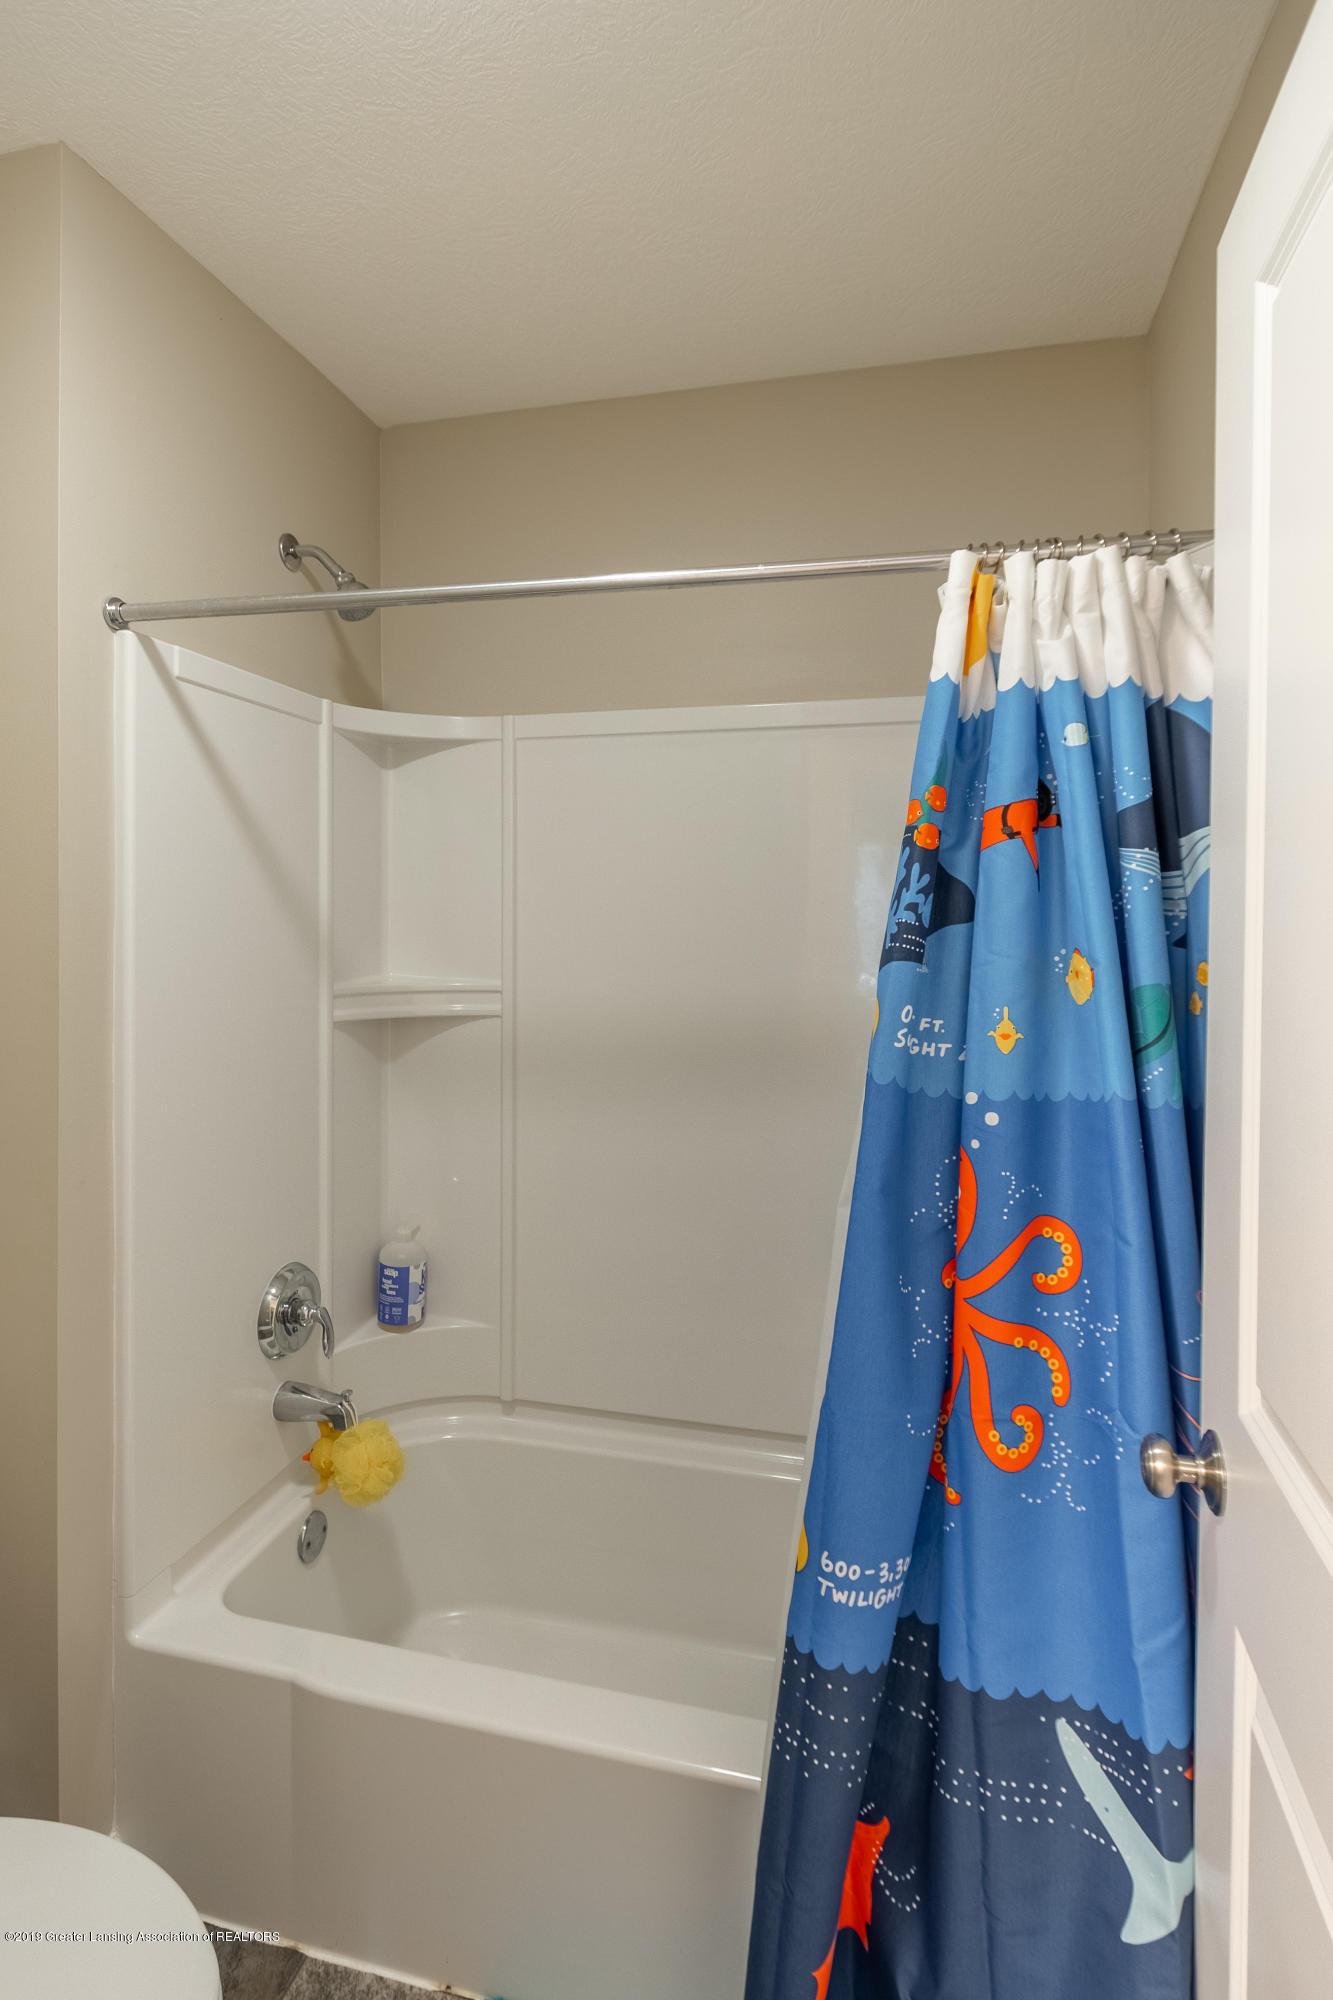 3758 Shearwater Ln - 2nd Floor bathroom - 41